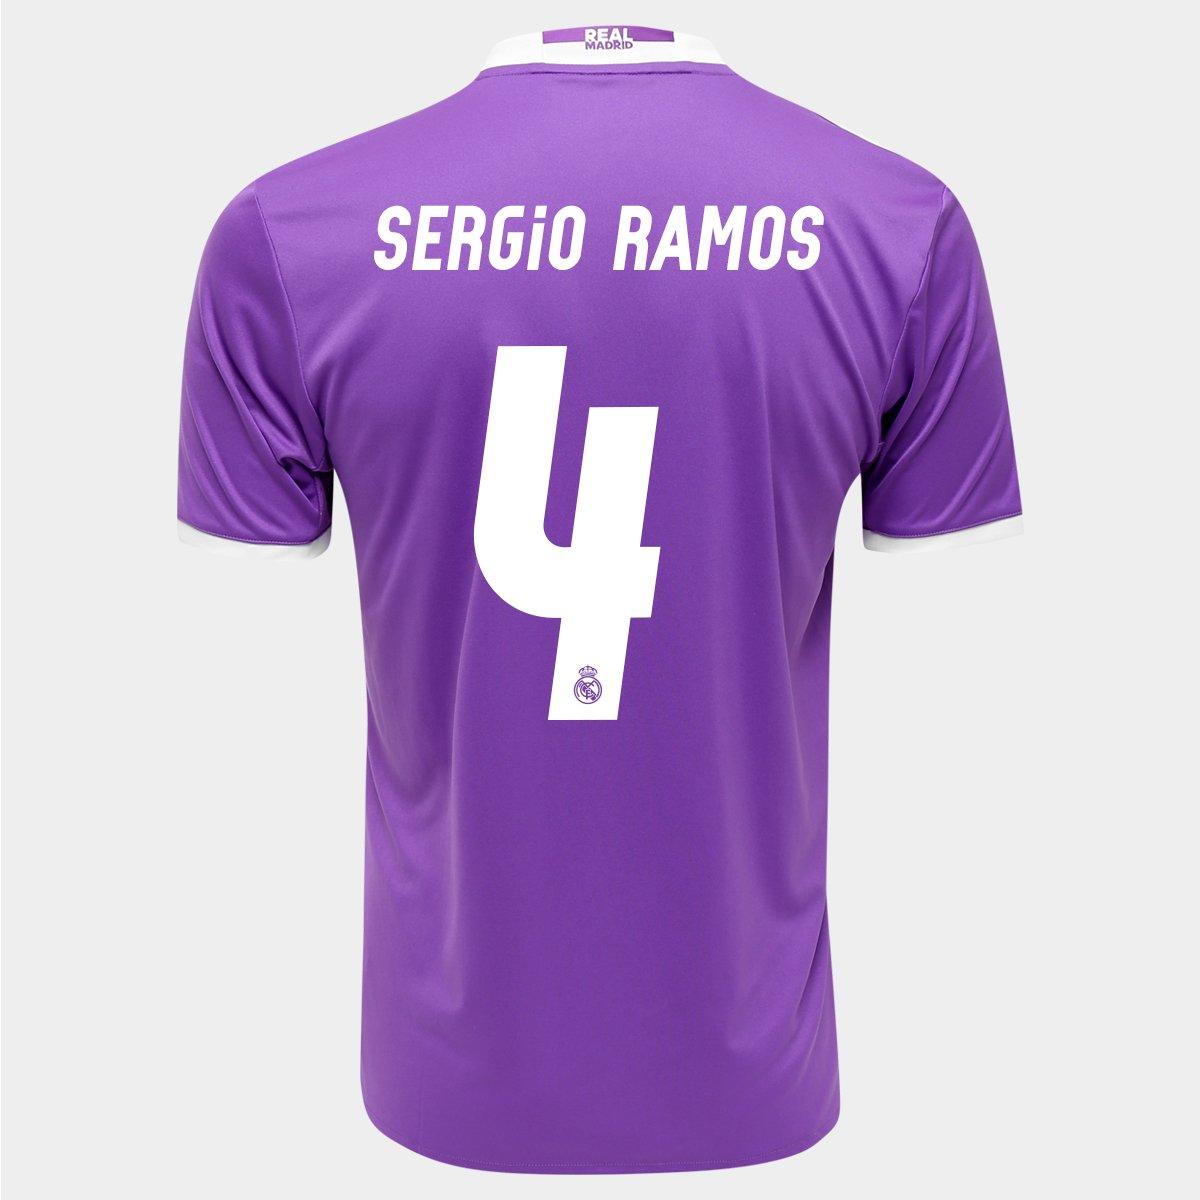 Camisa Adidas Real Madrid Away 16 17 nº 4 - Sergio Ramos - Compre Agora  08990433a0eb5